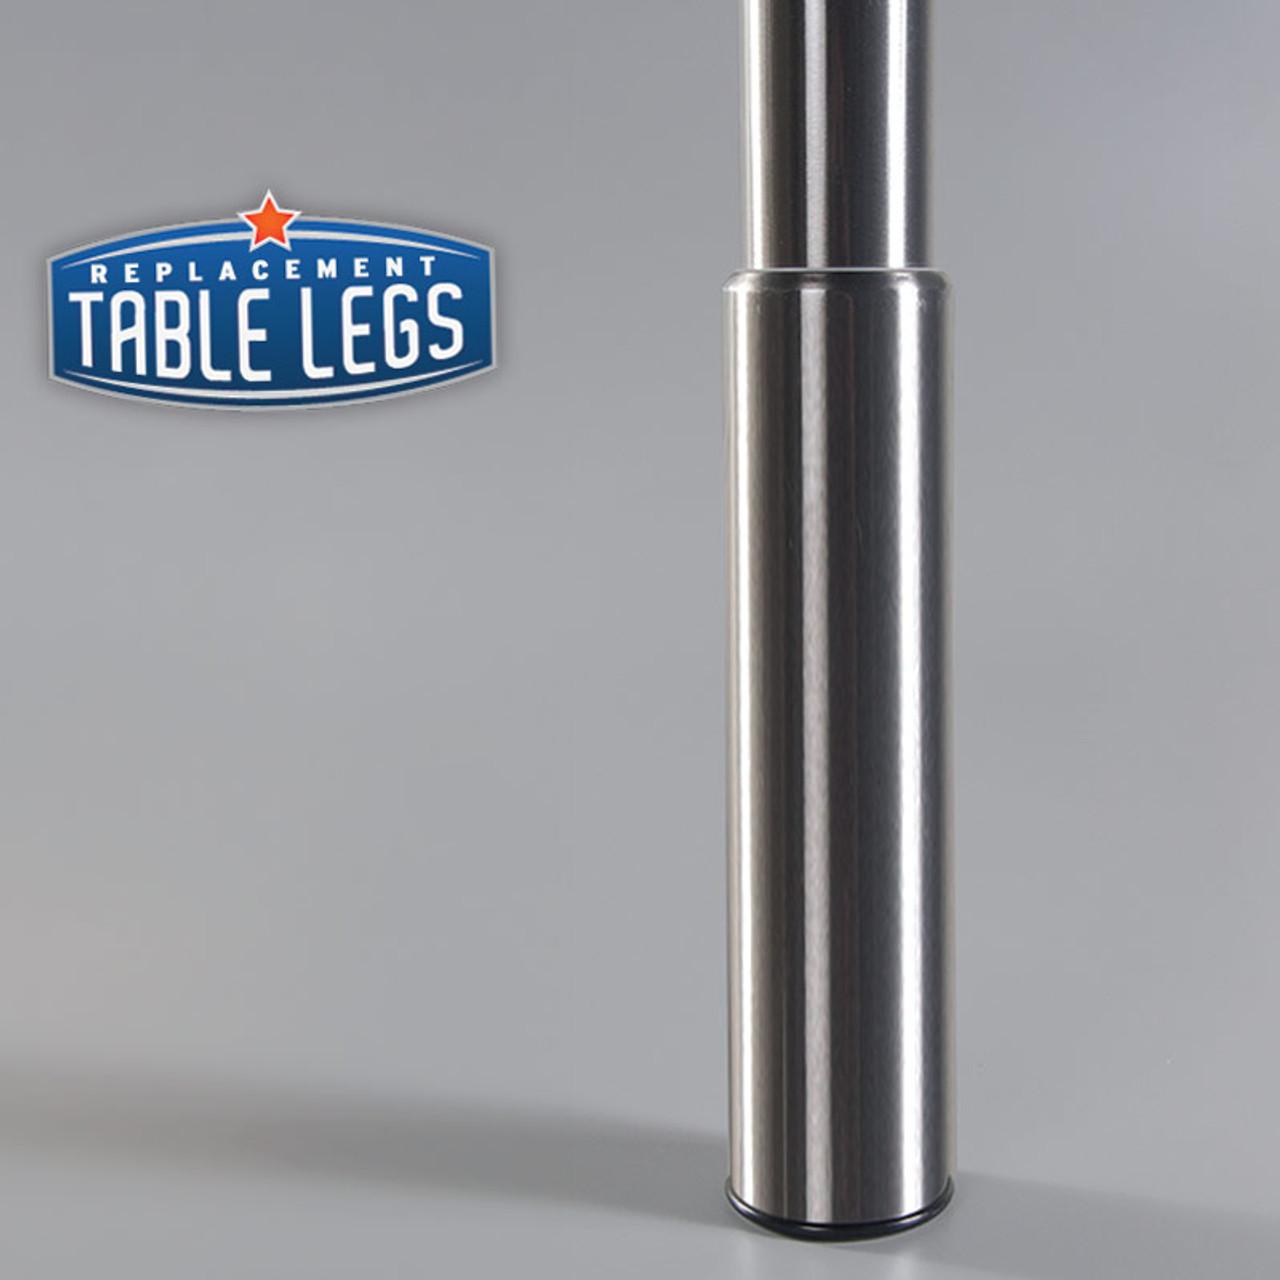 Brushed Steel Studio Telescoping Table Leg 7'' adjustable foot metal cover - replacementtablelegs.com